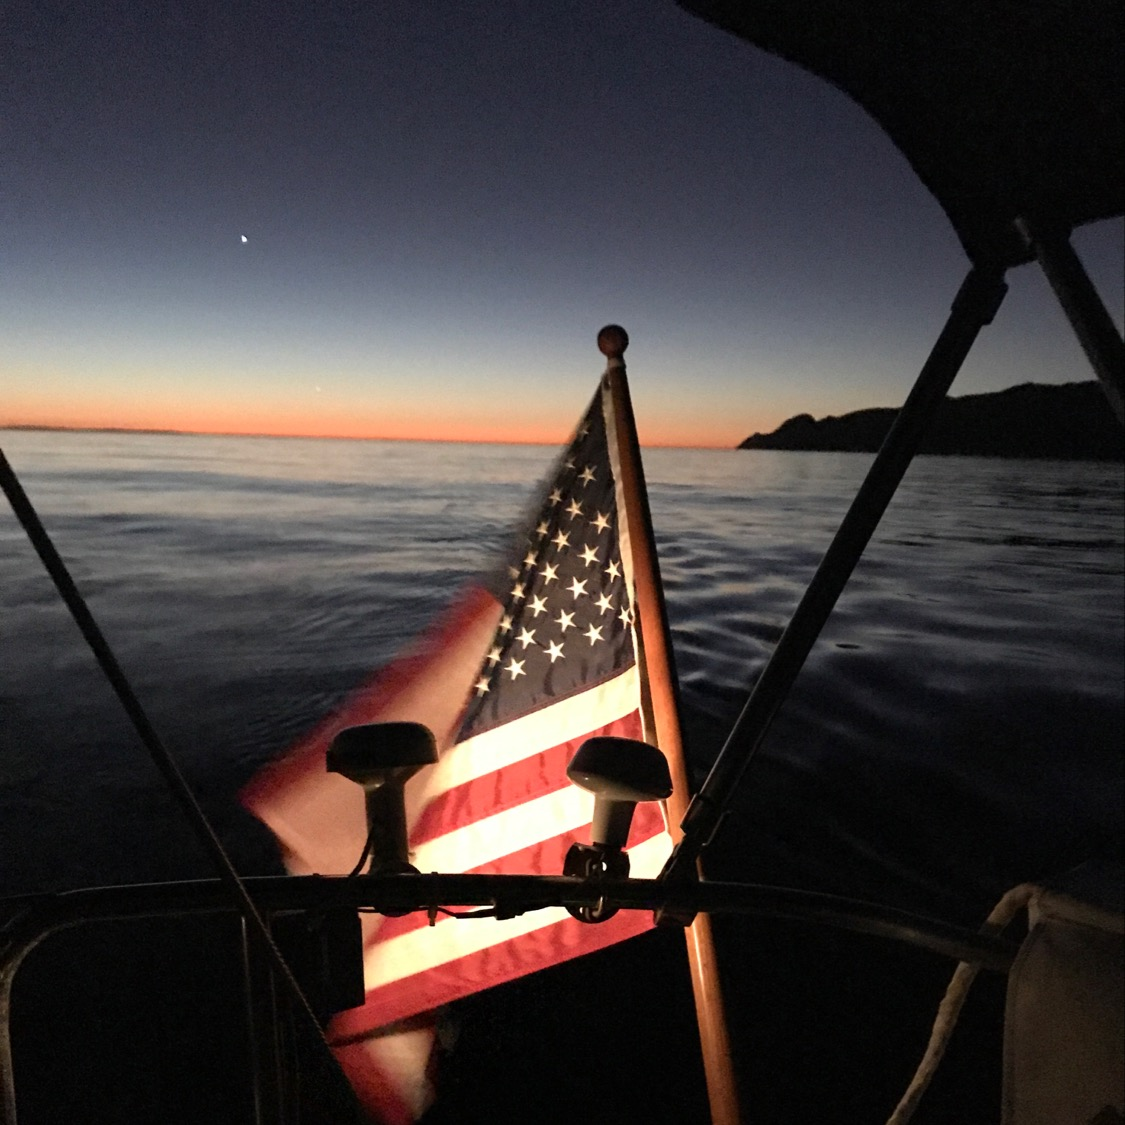 sail training international - sailing lessons and certification around Catalina Island